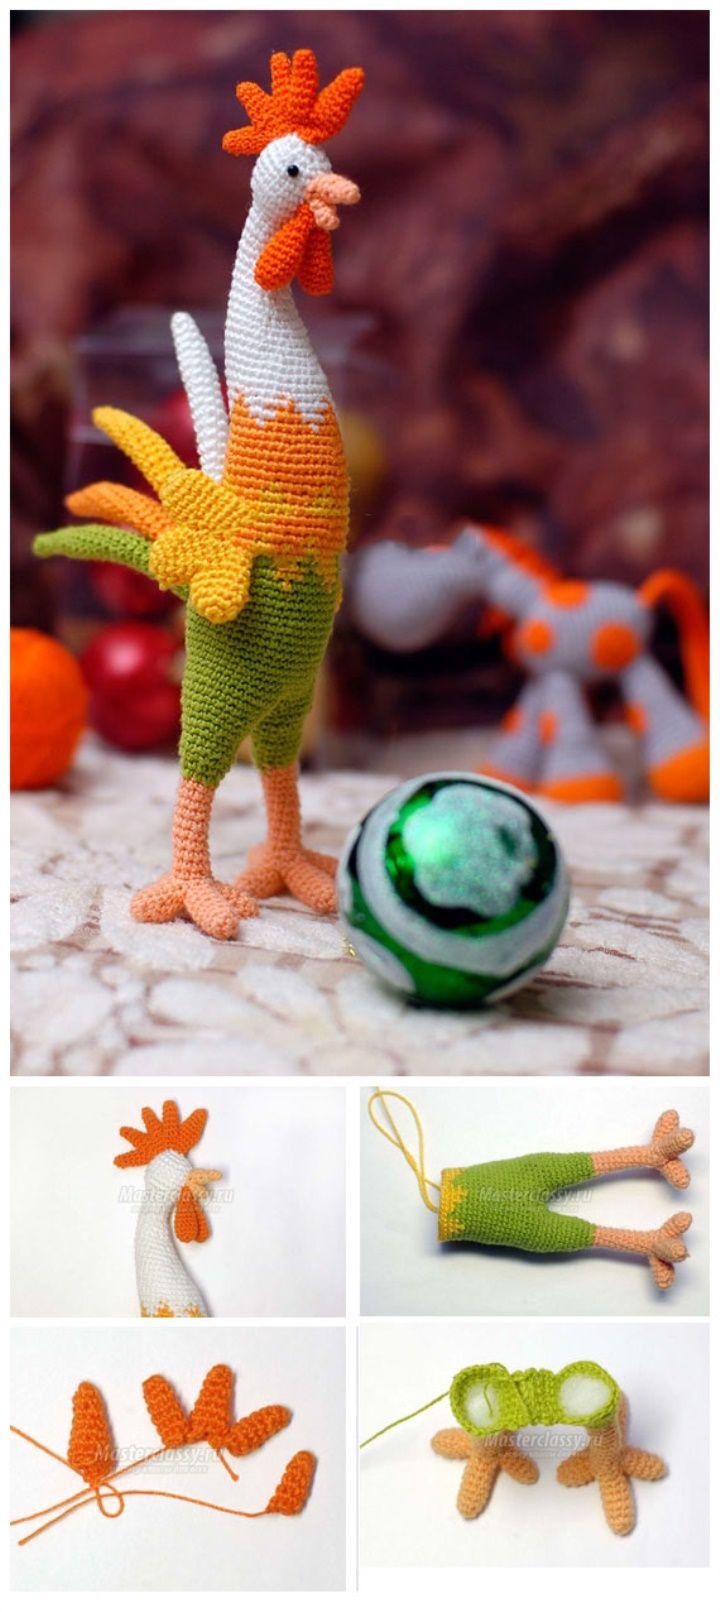 Amigurumi Rooster Crochet   Crocheted Birds   Pinterest   Patrón ...